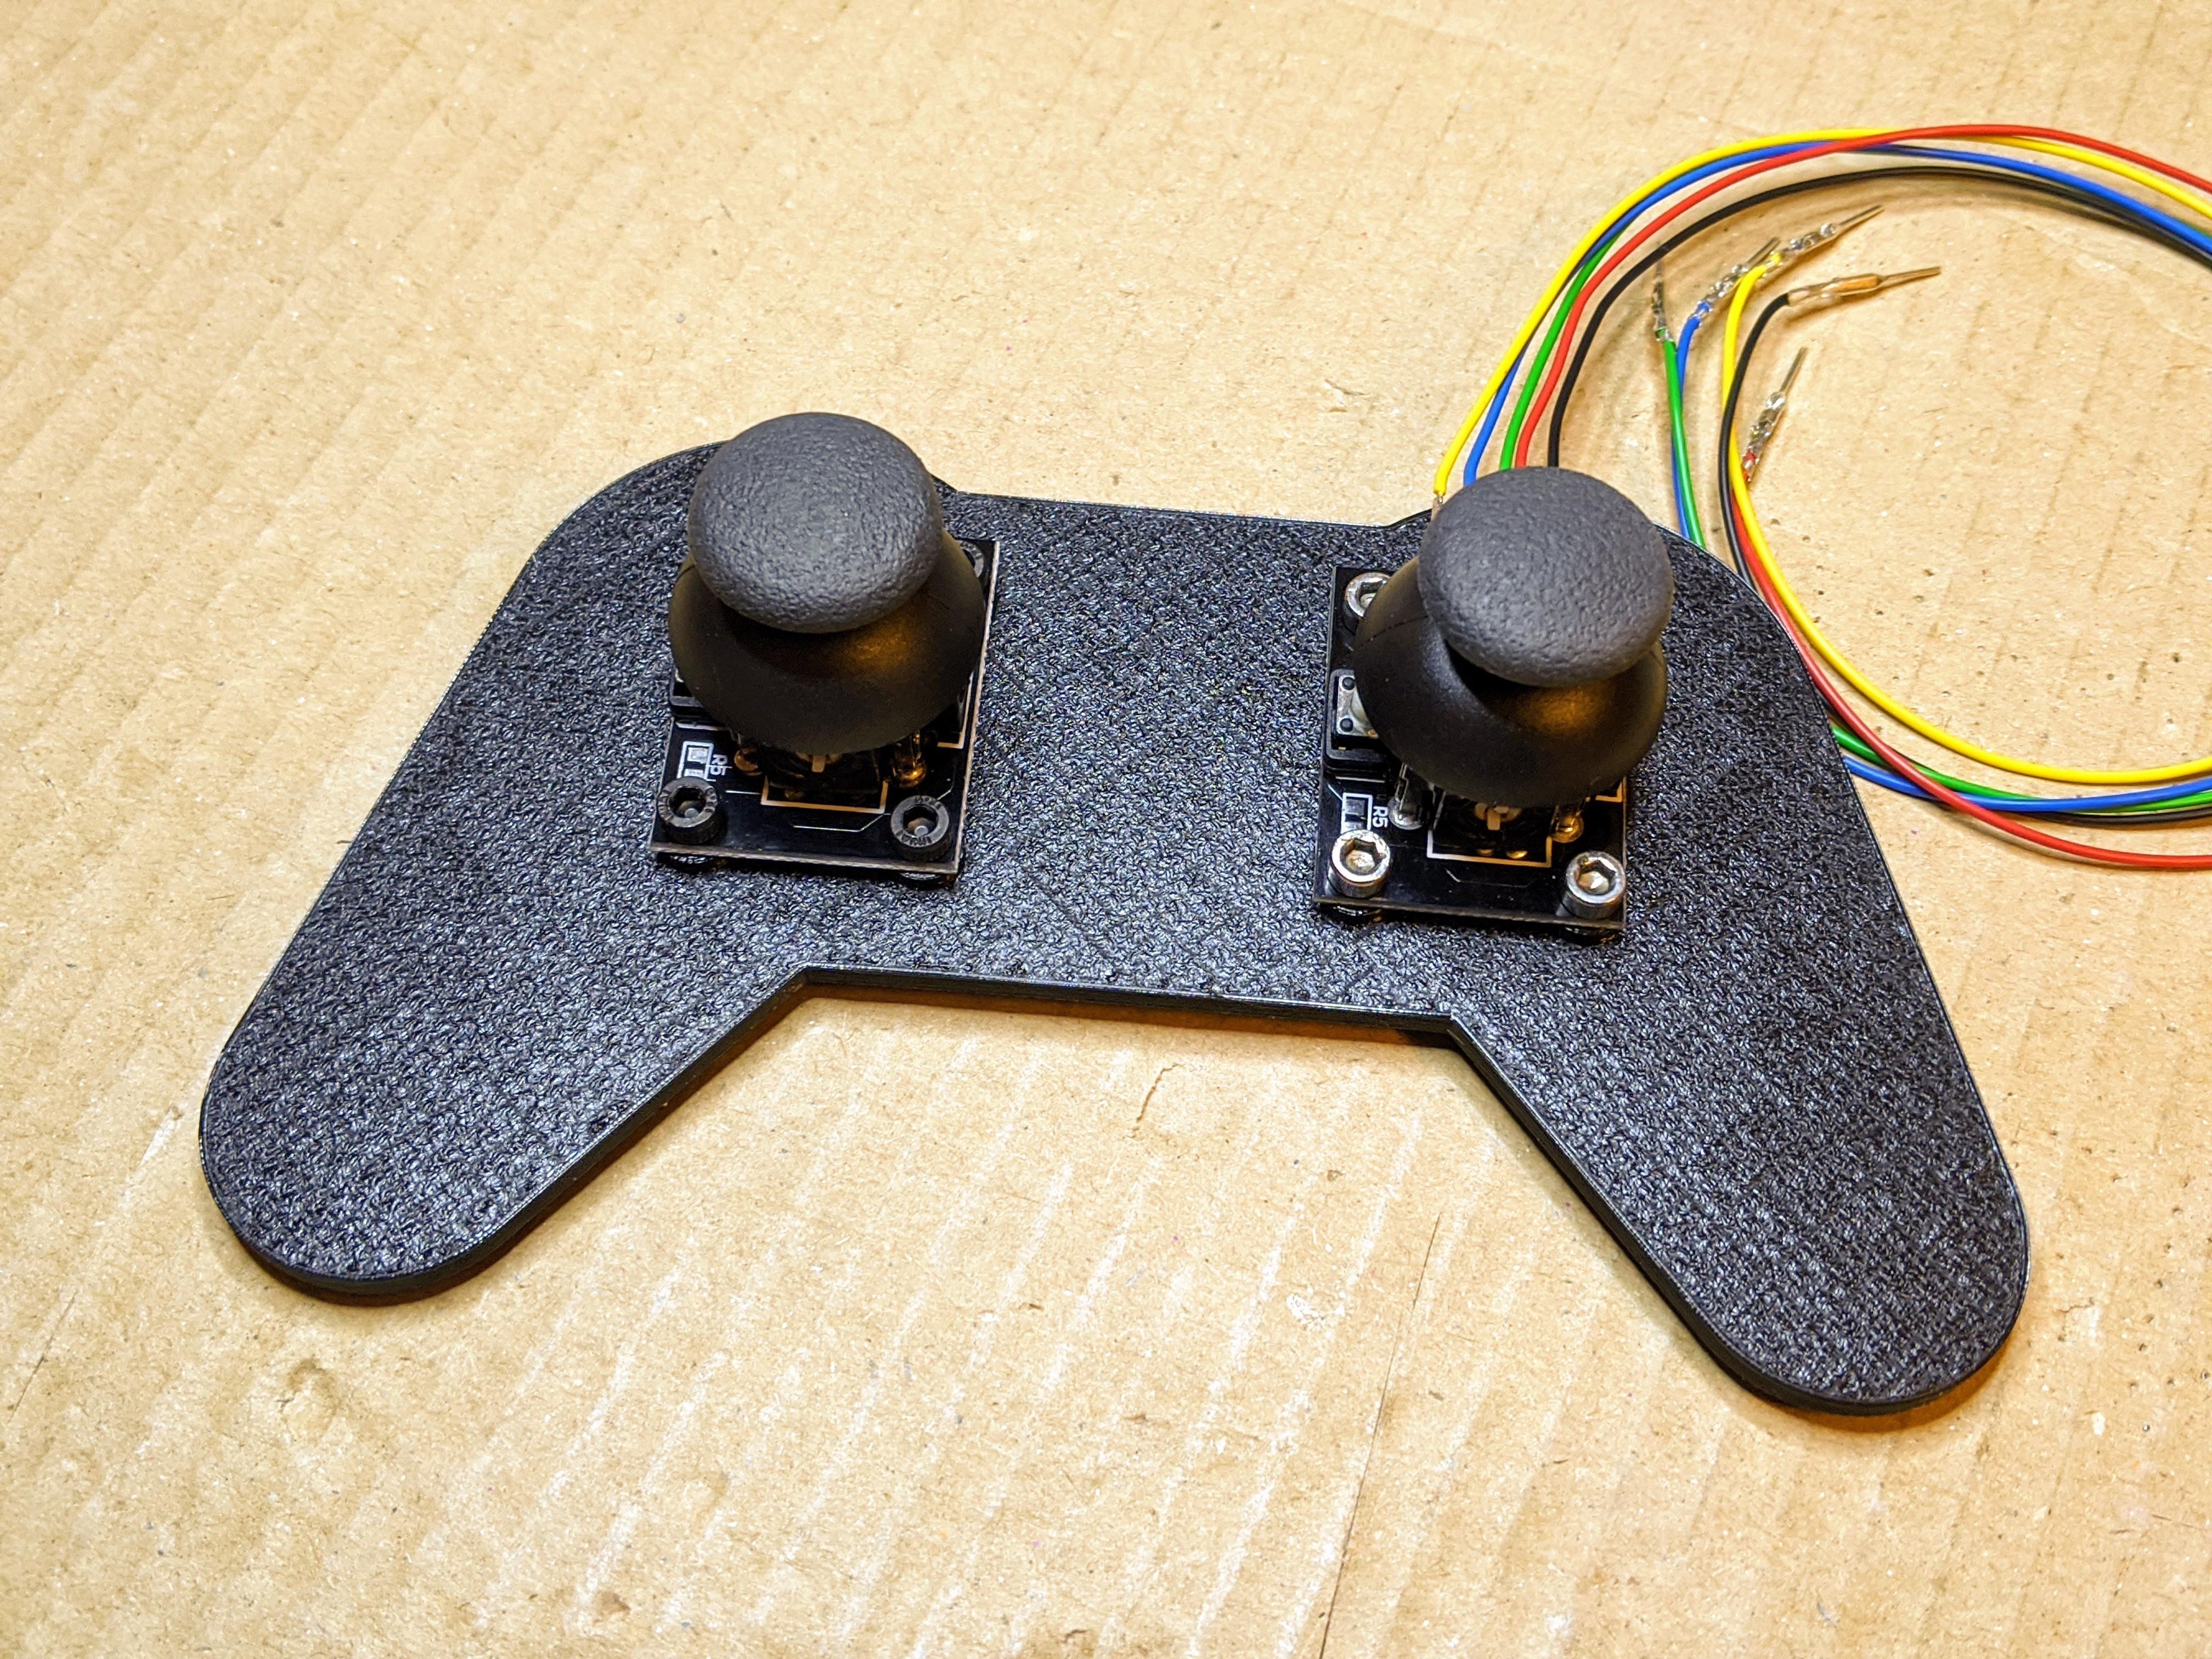 101.jpg Download free SCAD file Joystick controller test bracket • 3D printer object, t0b1